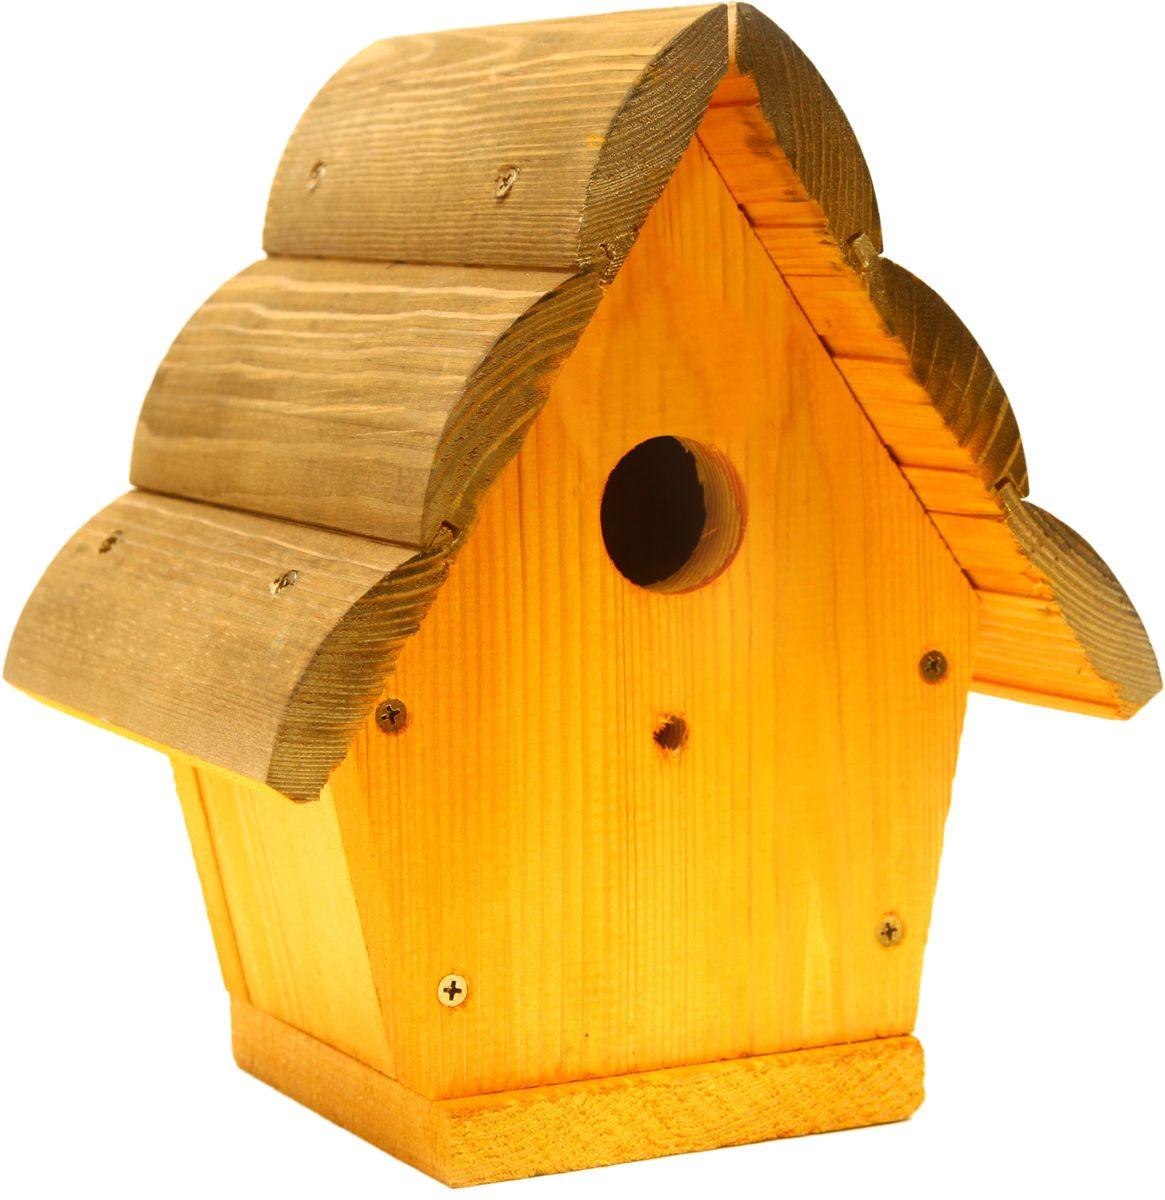 Домик для птиц Proffi. PH8475PH8475Габариты (мм) ДхШхВ: 246 х 180 х 325 мм. Вес (кг): 2,4 кг. Материал: Сосна. Цвет: Орегончерешня.